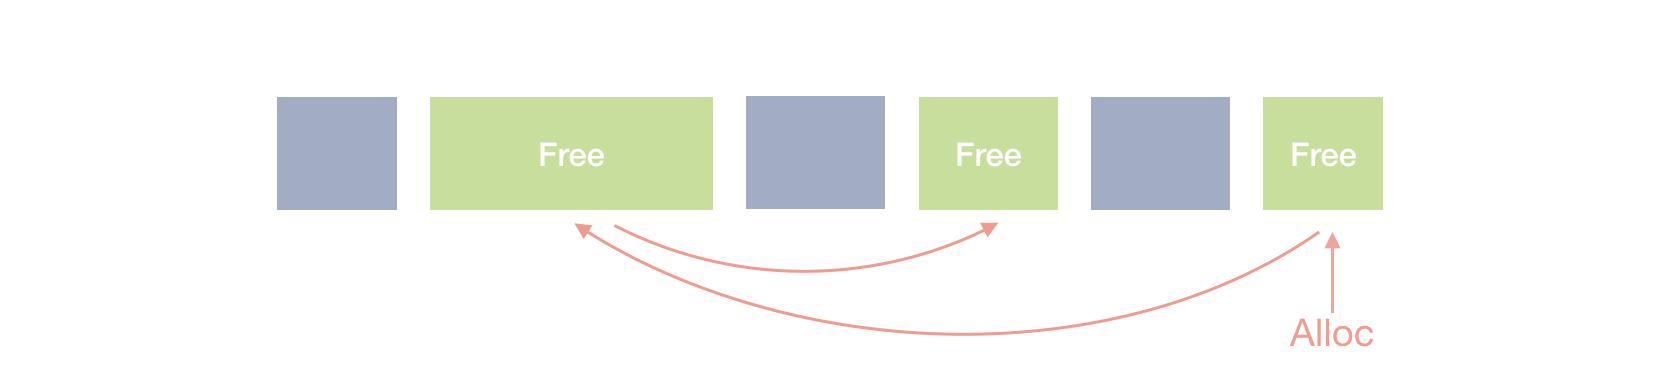 Explicit Free-list